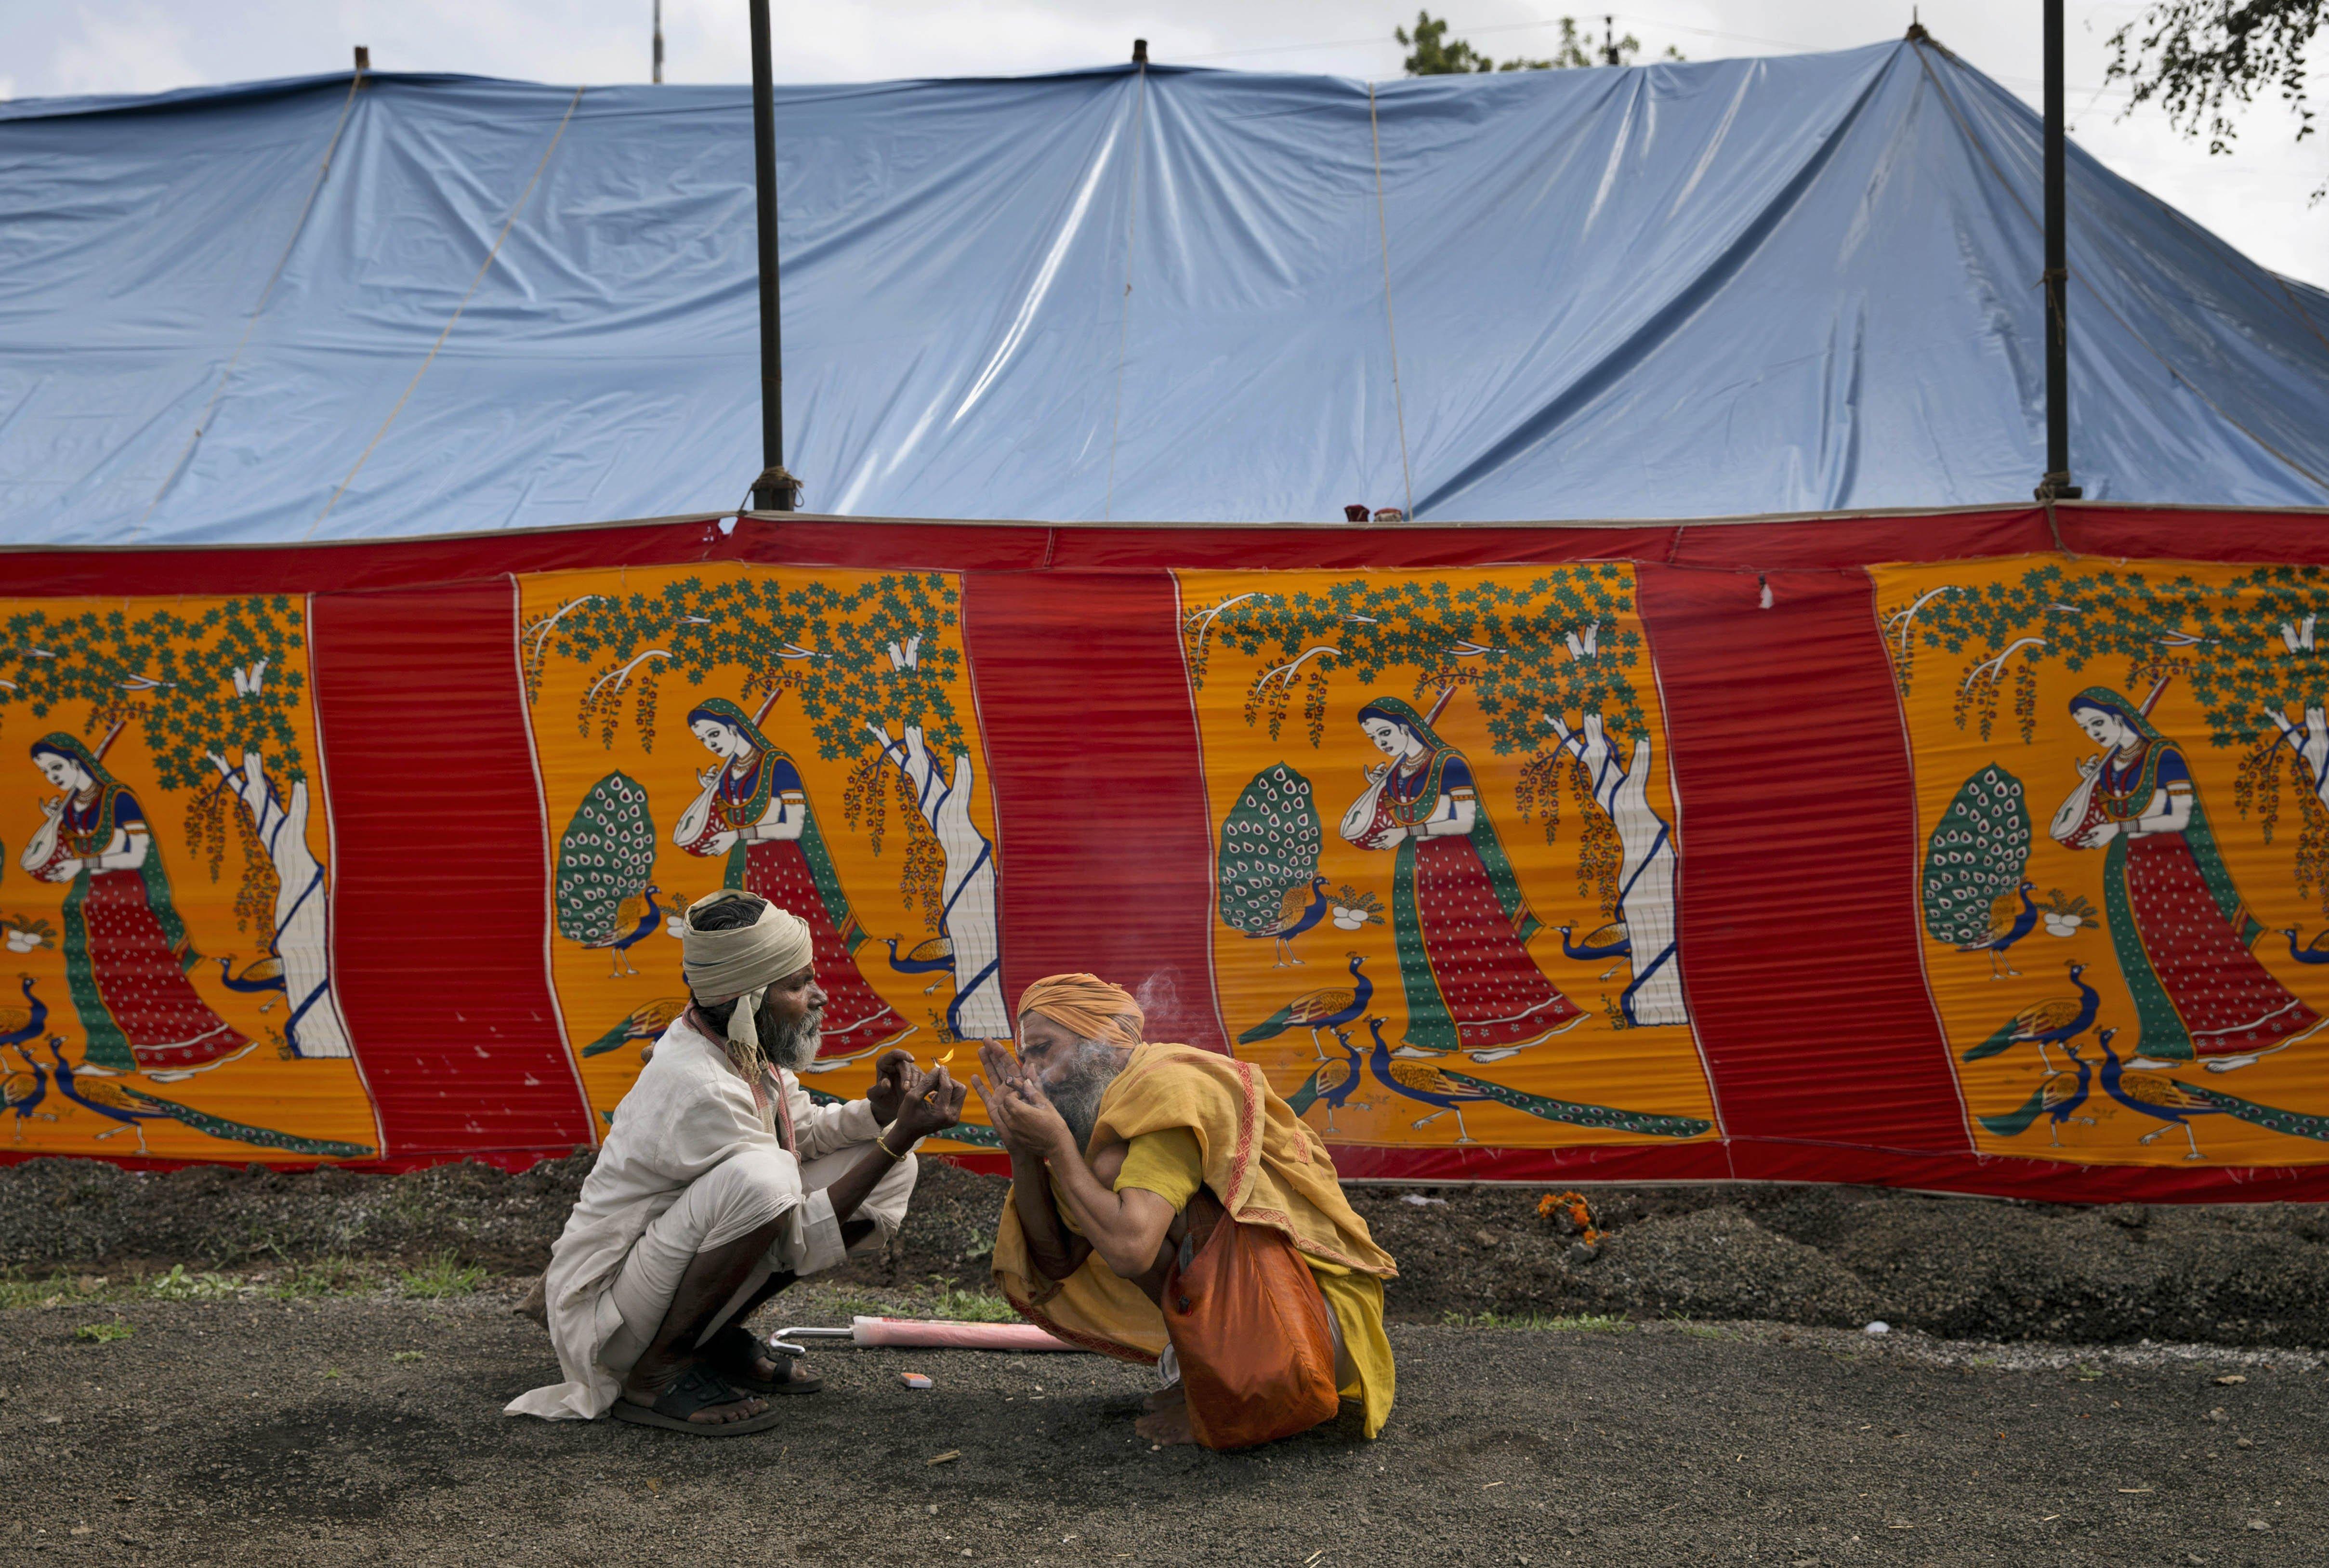 Indian Sadhus, or Hindu holy men, smoke near a makeshift shelter at the Kumbh Mela in Nasik, India, on Aug. 27, 2015.